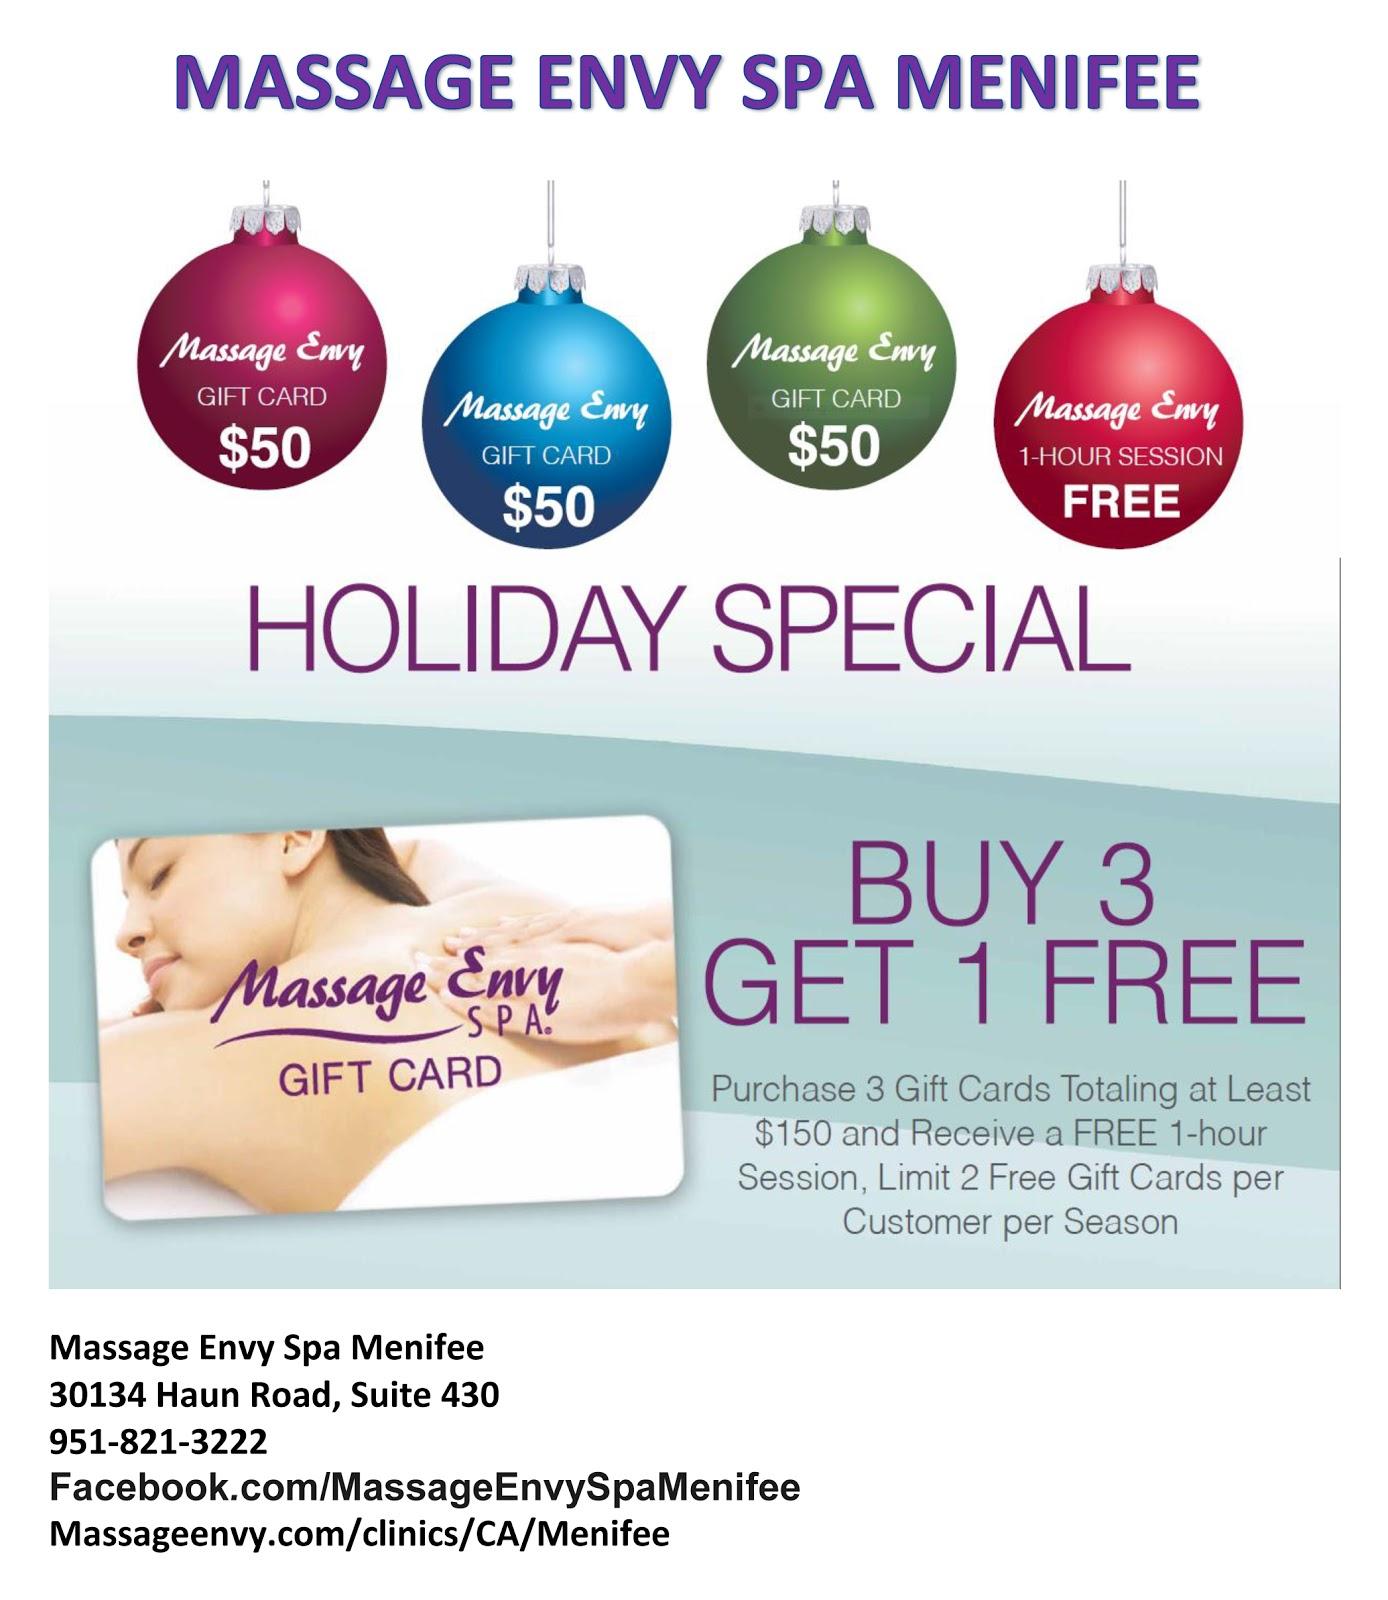 Holiday Gift Card Special At Massage Envy Spa Menifee Menifee 24 7